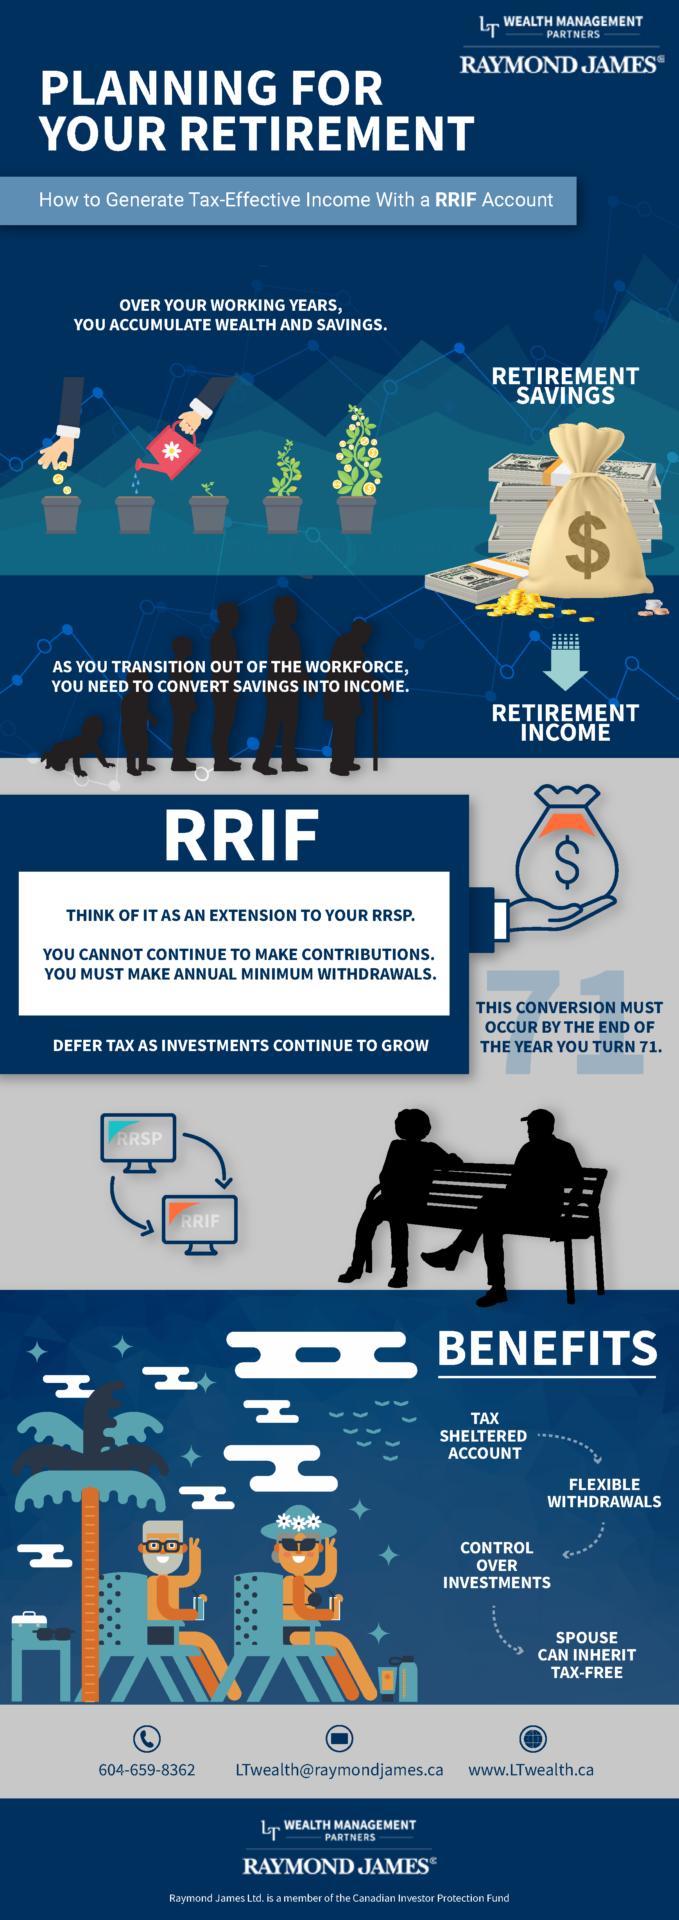 RRIF Infographic